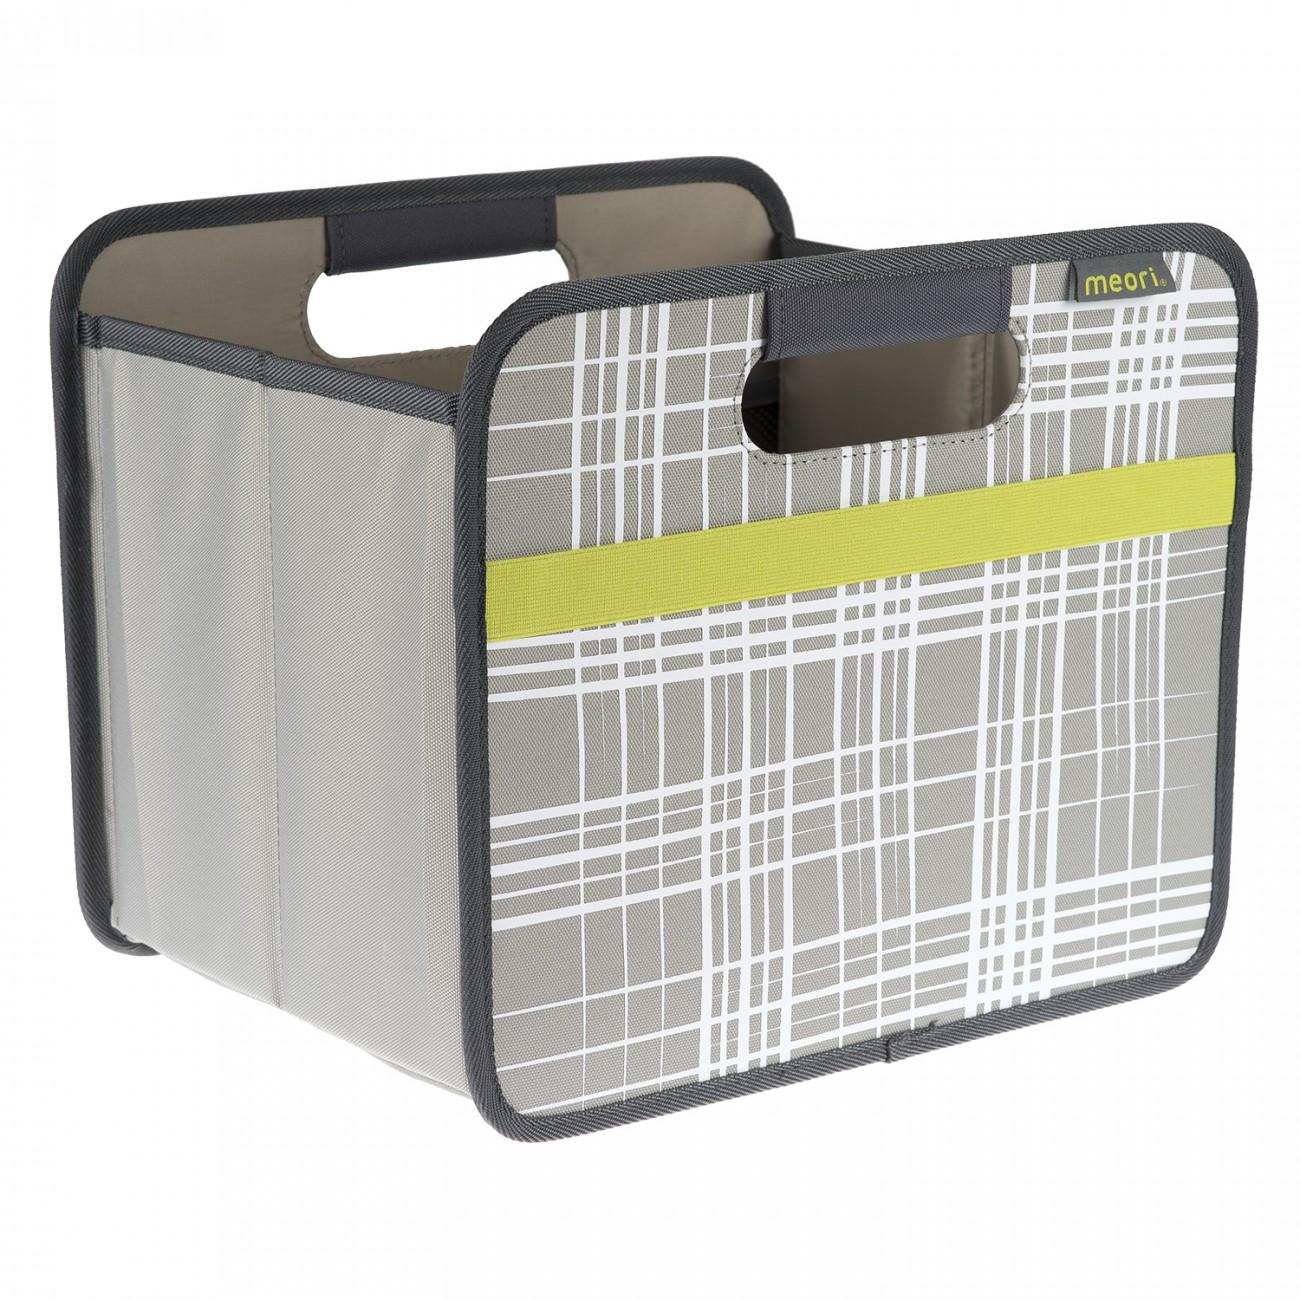 meori 15l mehrzweckbox f r ikea kallax expedit aufbewahrung faltbare kiste grau ebay. Black Bedroom Furniture Sets. Home Design Ideas